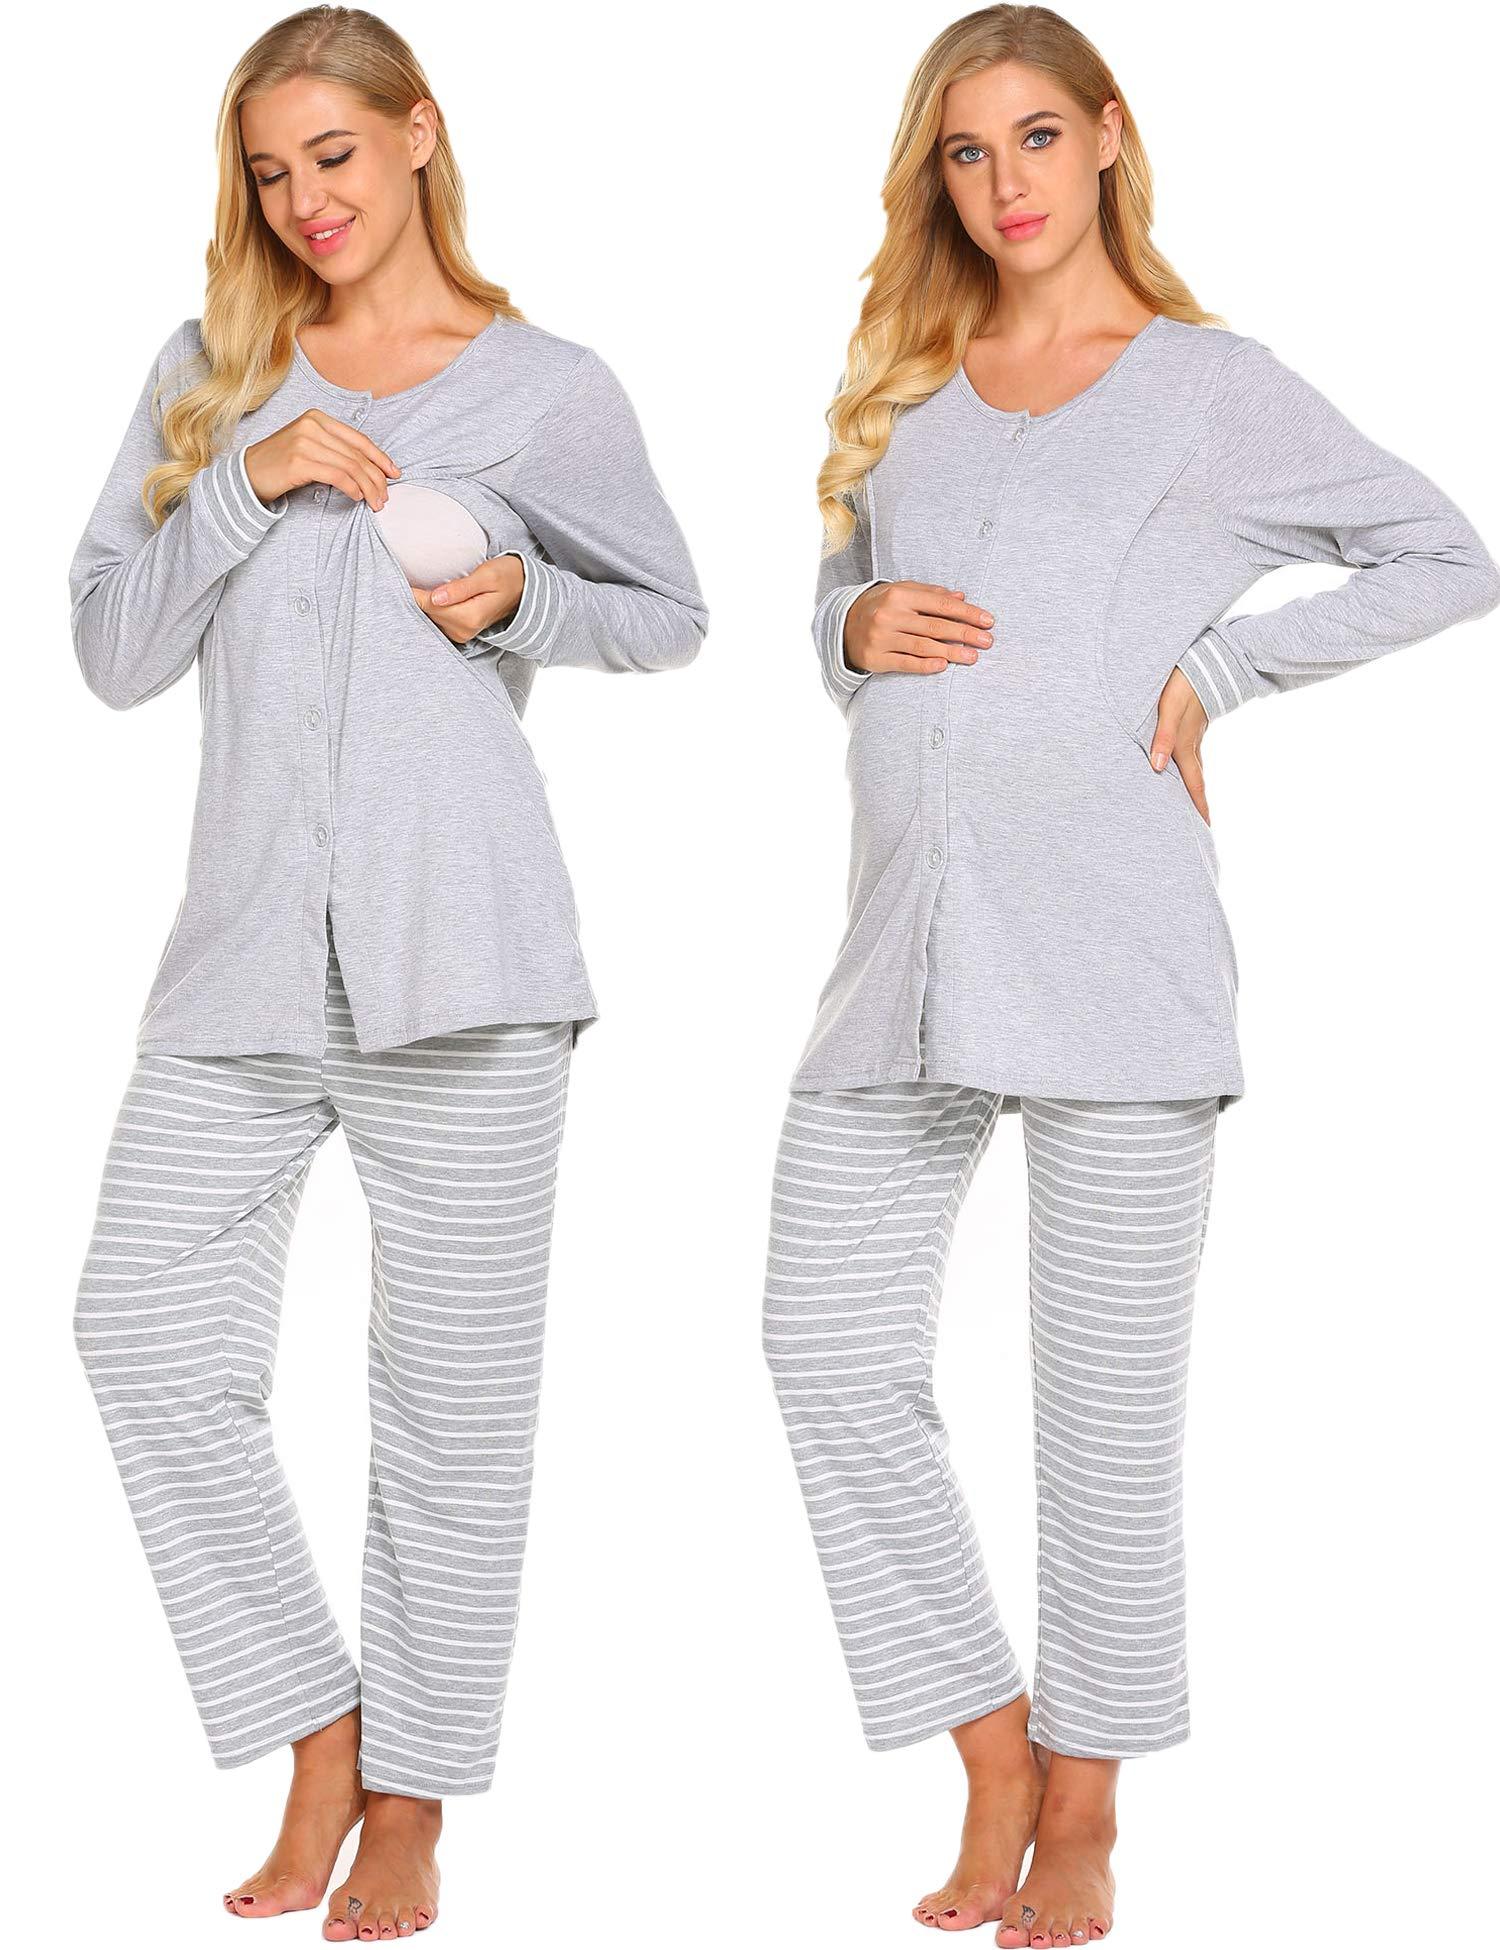 Ekouaer Womens Maternity Nursing Pajamas Set-Soft Breastfeeding Pregnancy Sleepwear Pjs Set,Bgrey,XX-Large